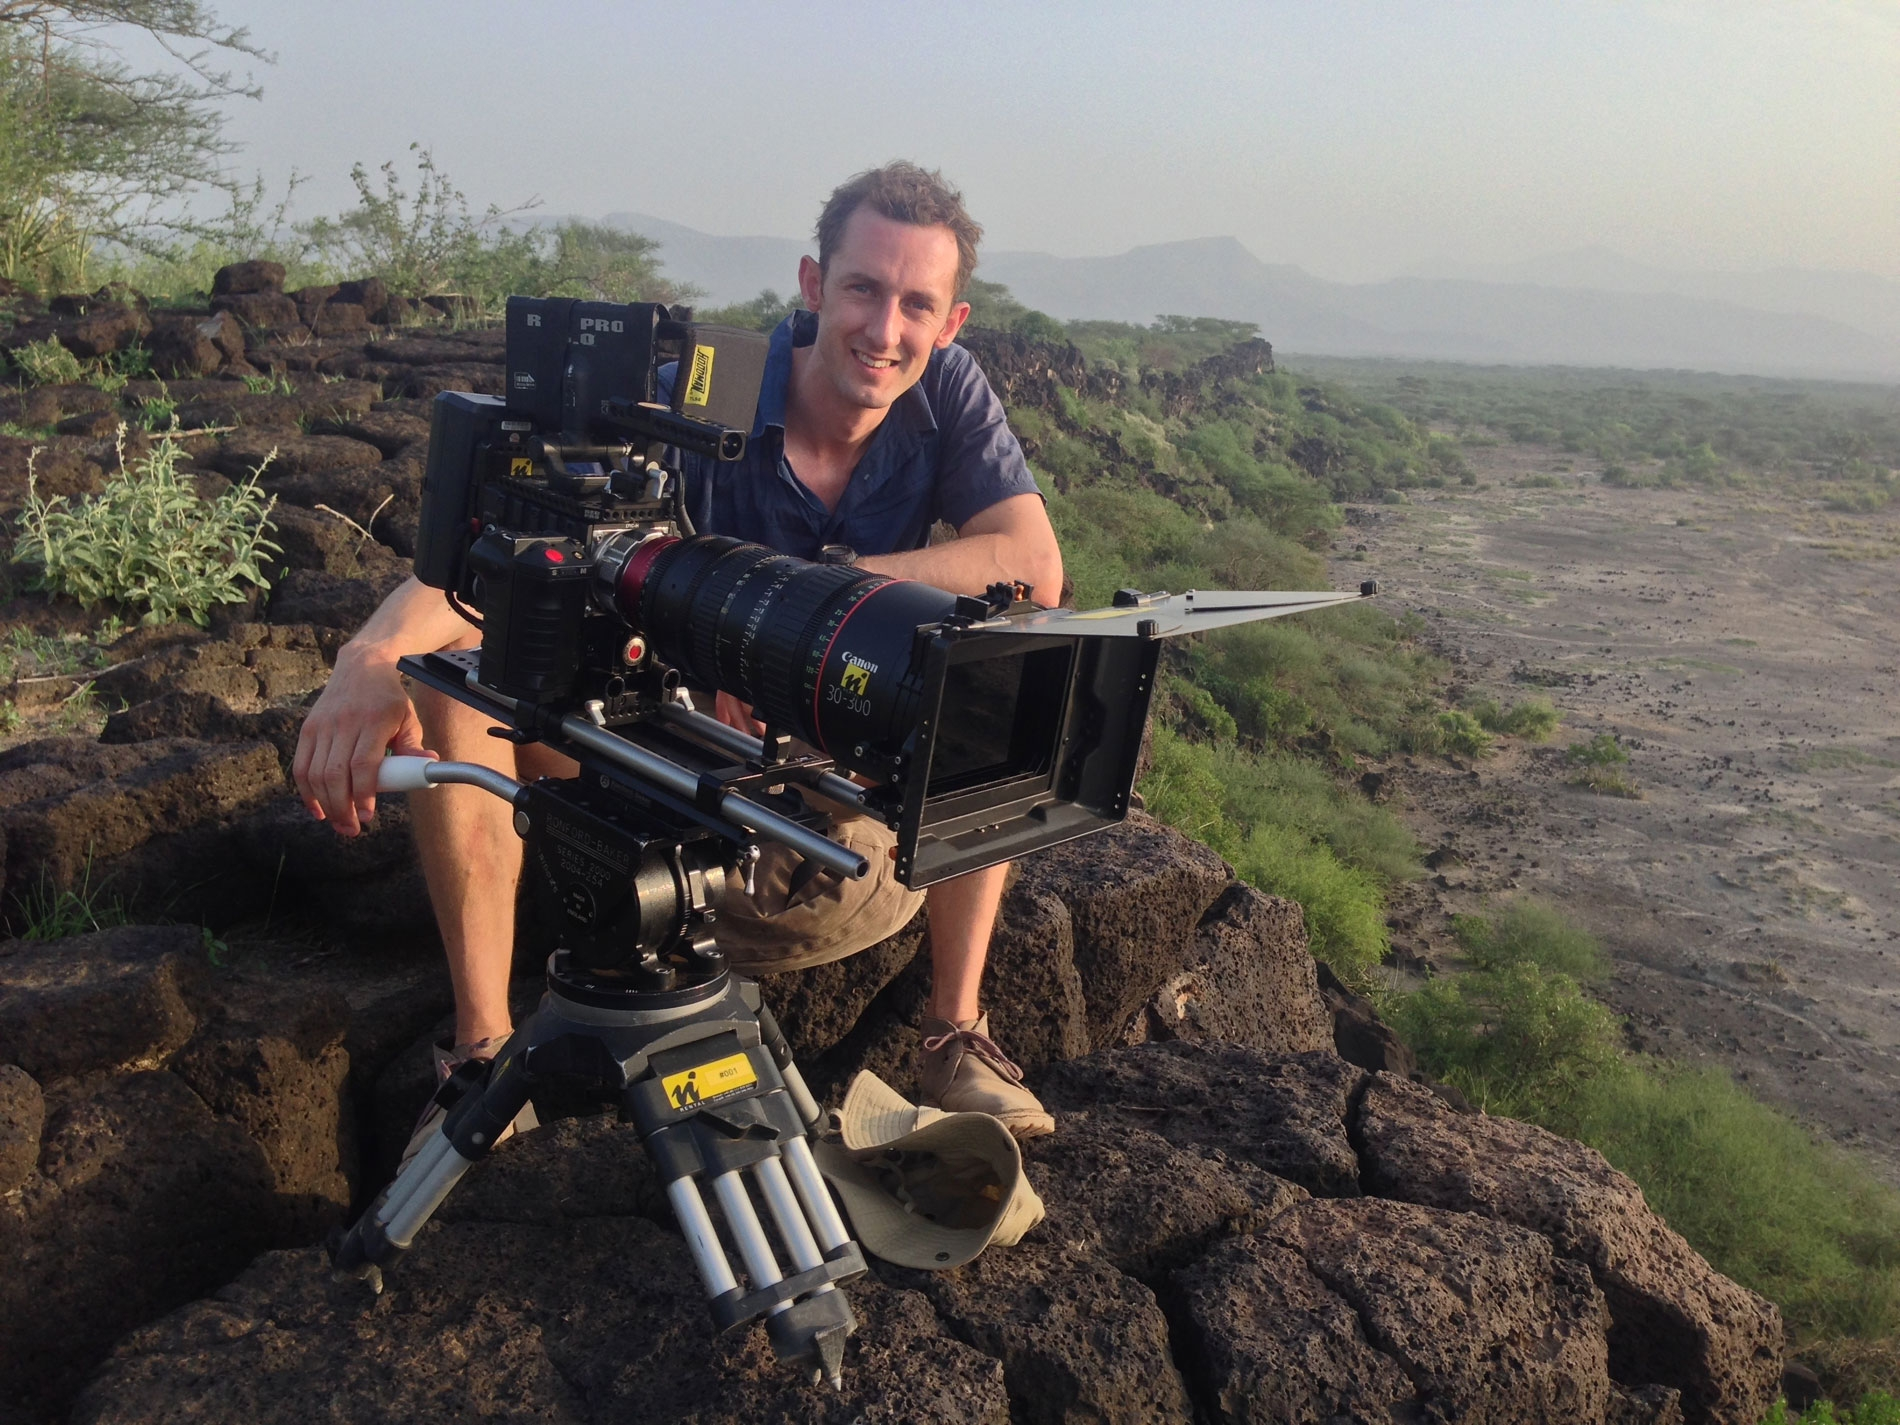 Pete Cayless Films